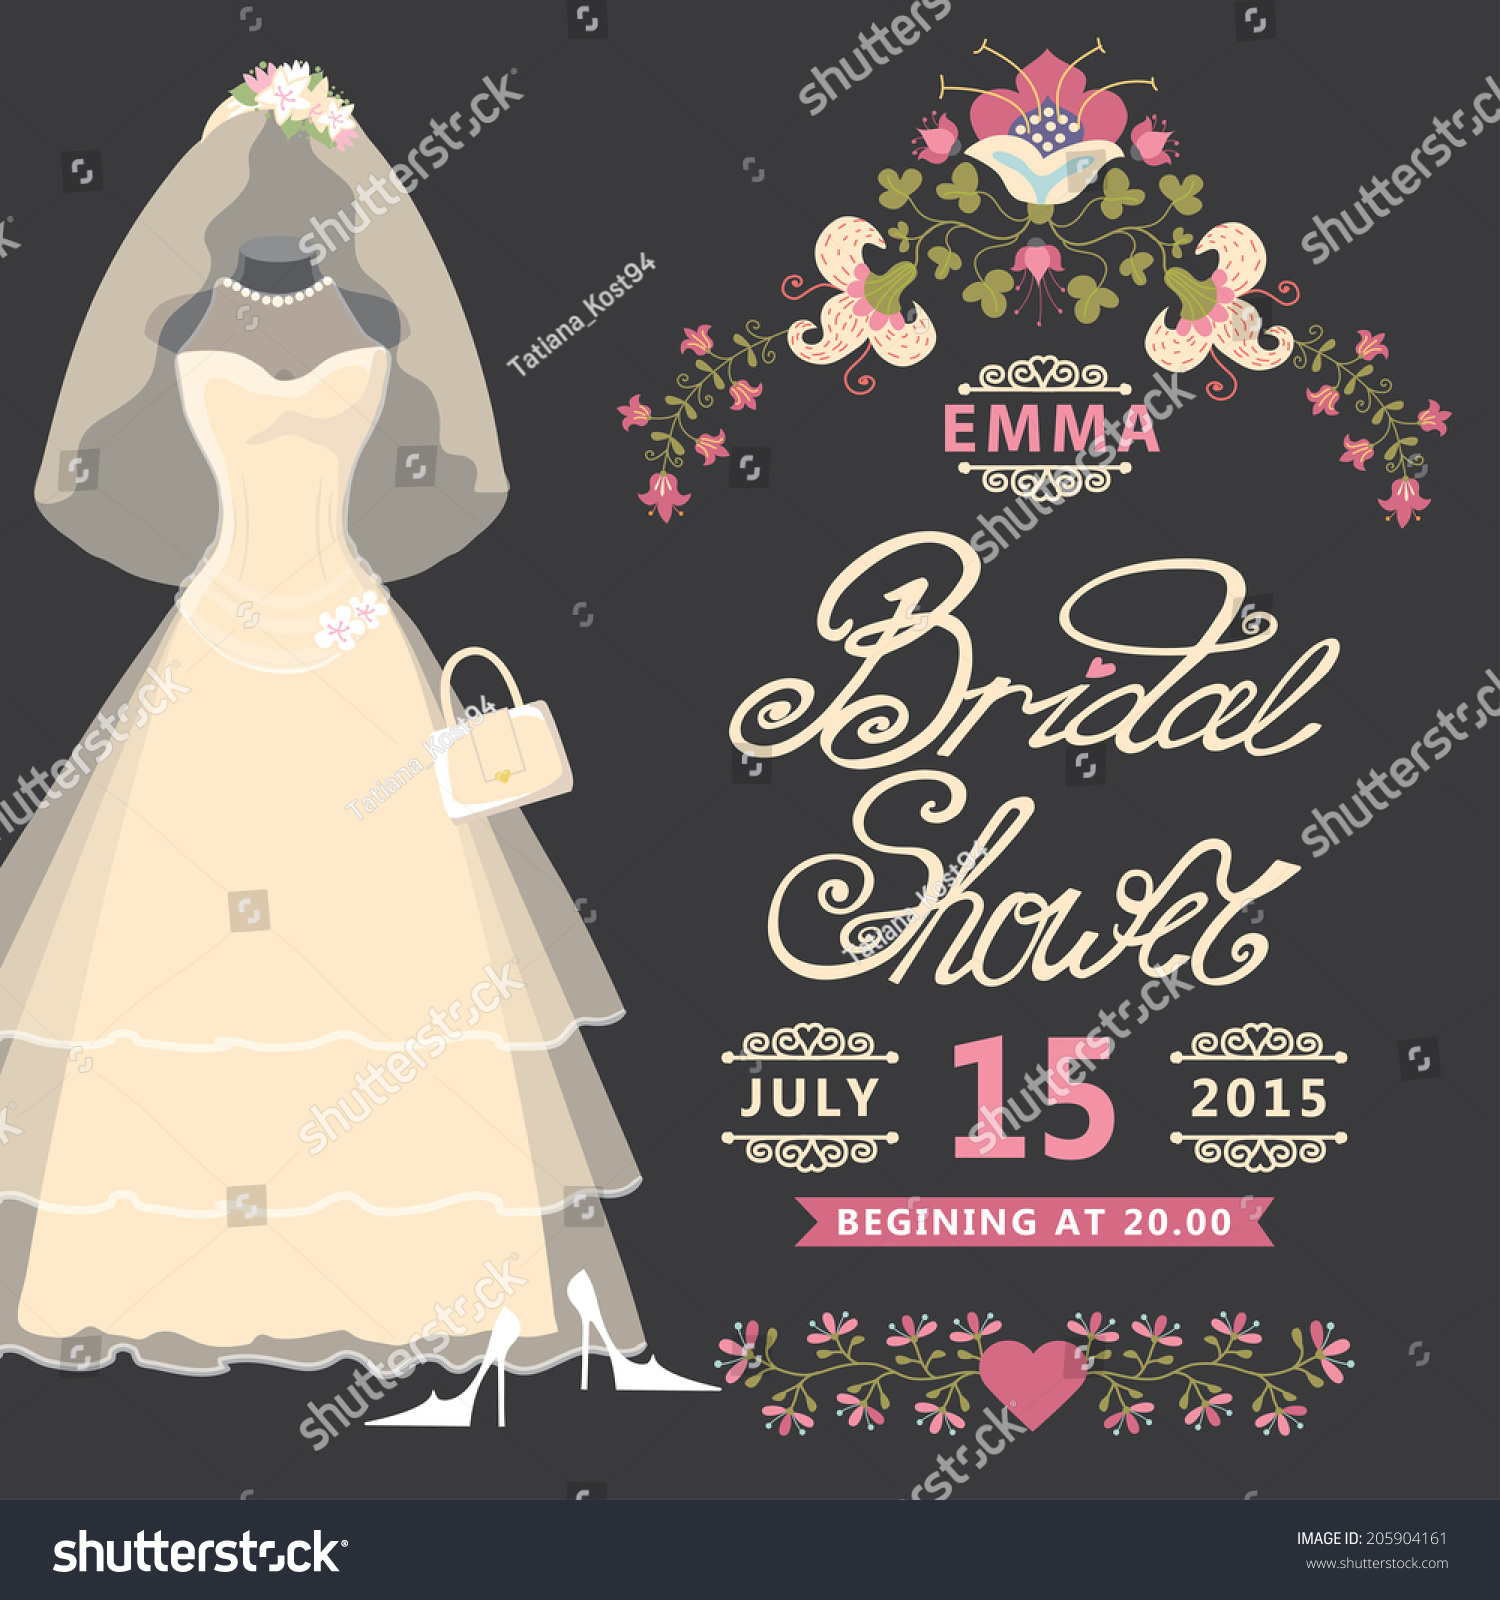 Bridal Shower Invitation Card Vintage Wedding Vector – Wedding Dress Shower Invitations